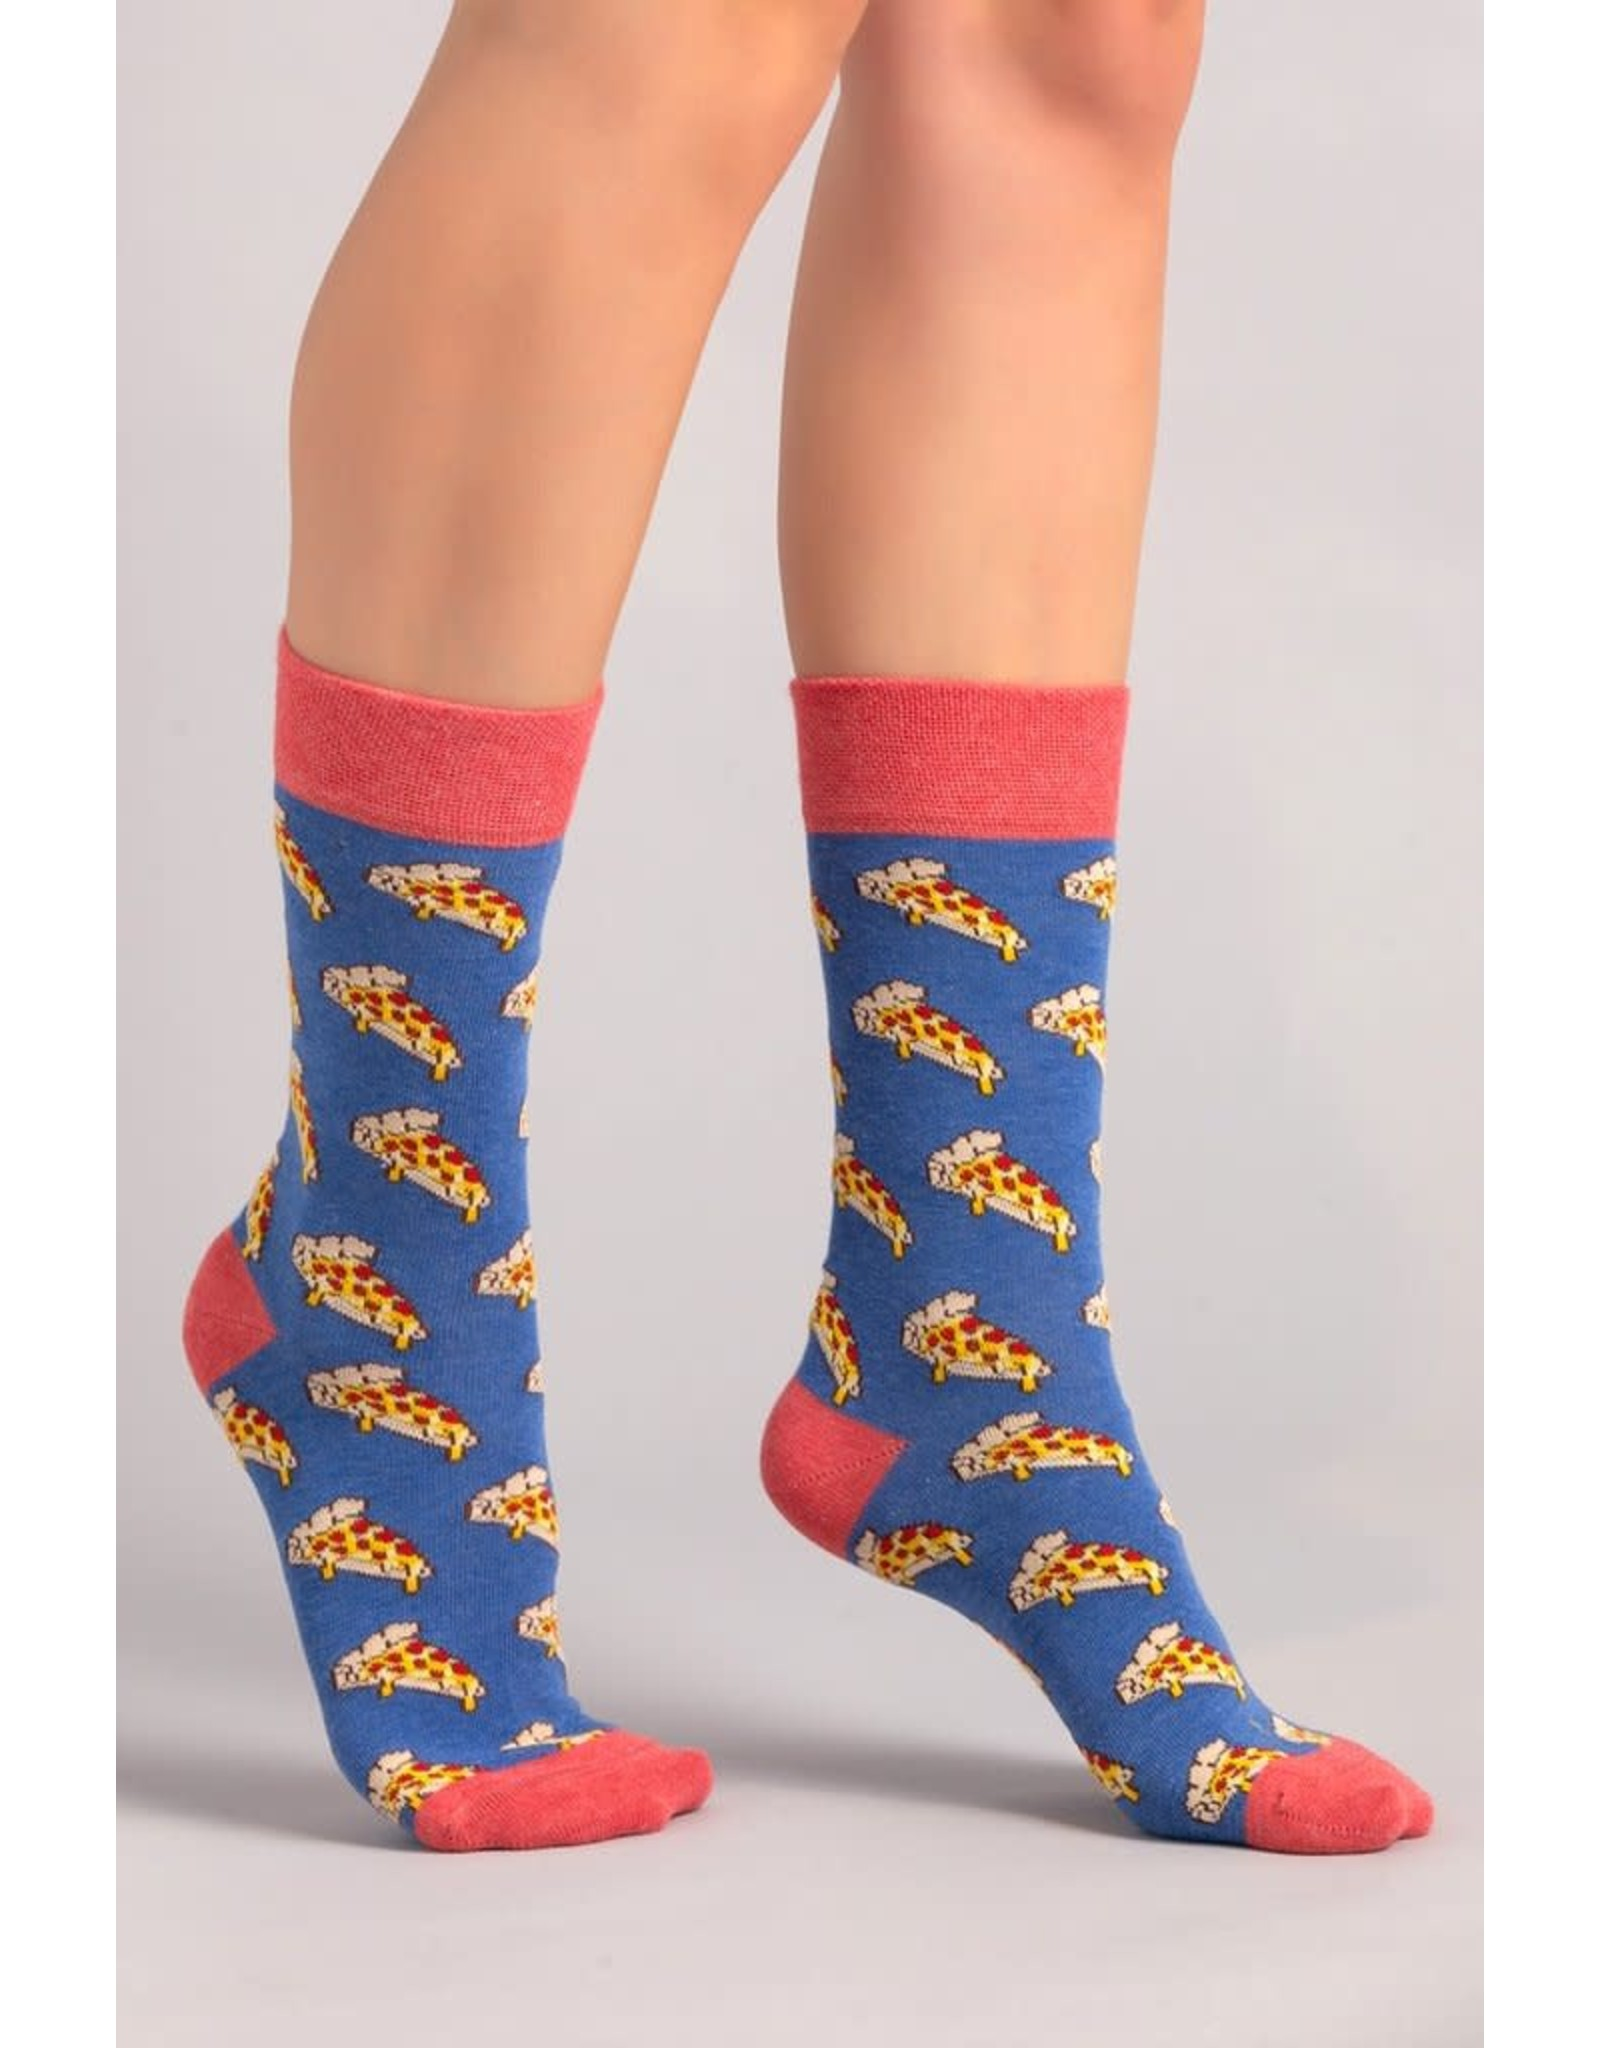 Moustard socks - pizza (36-40)